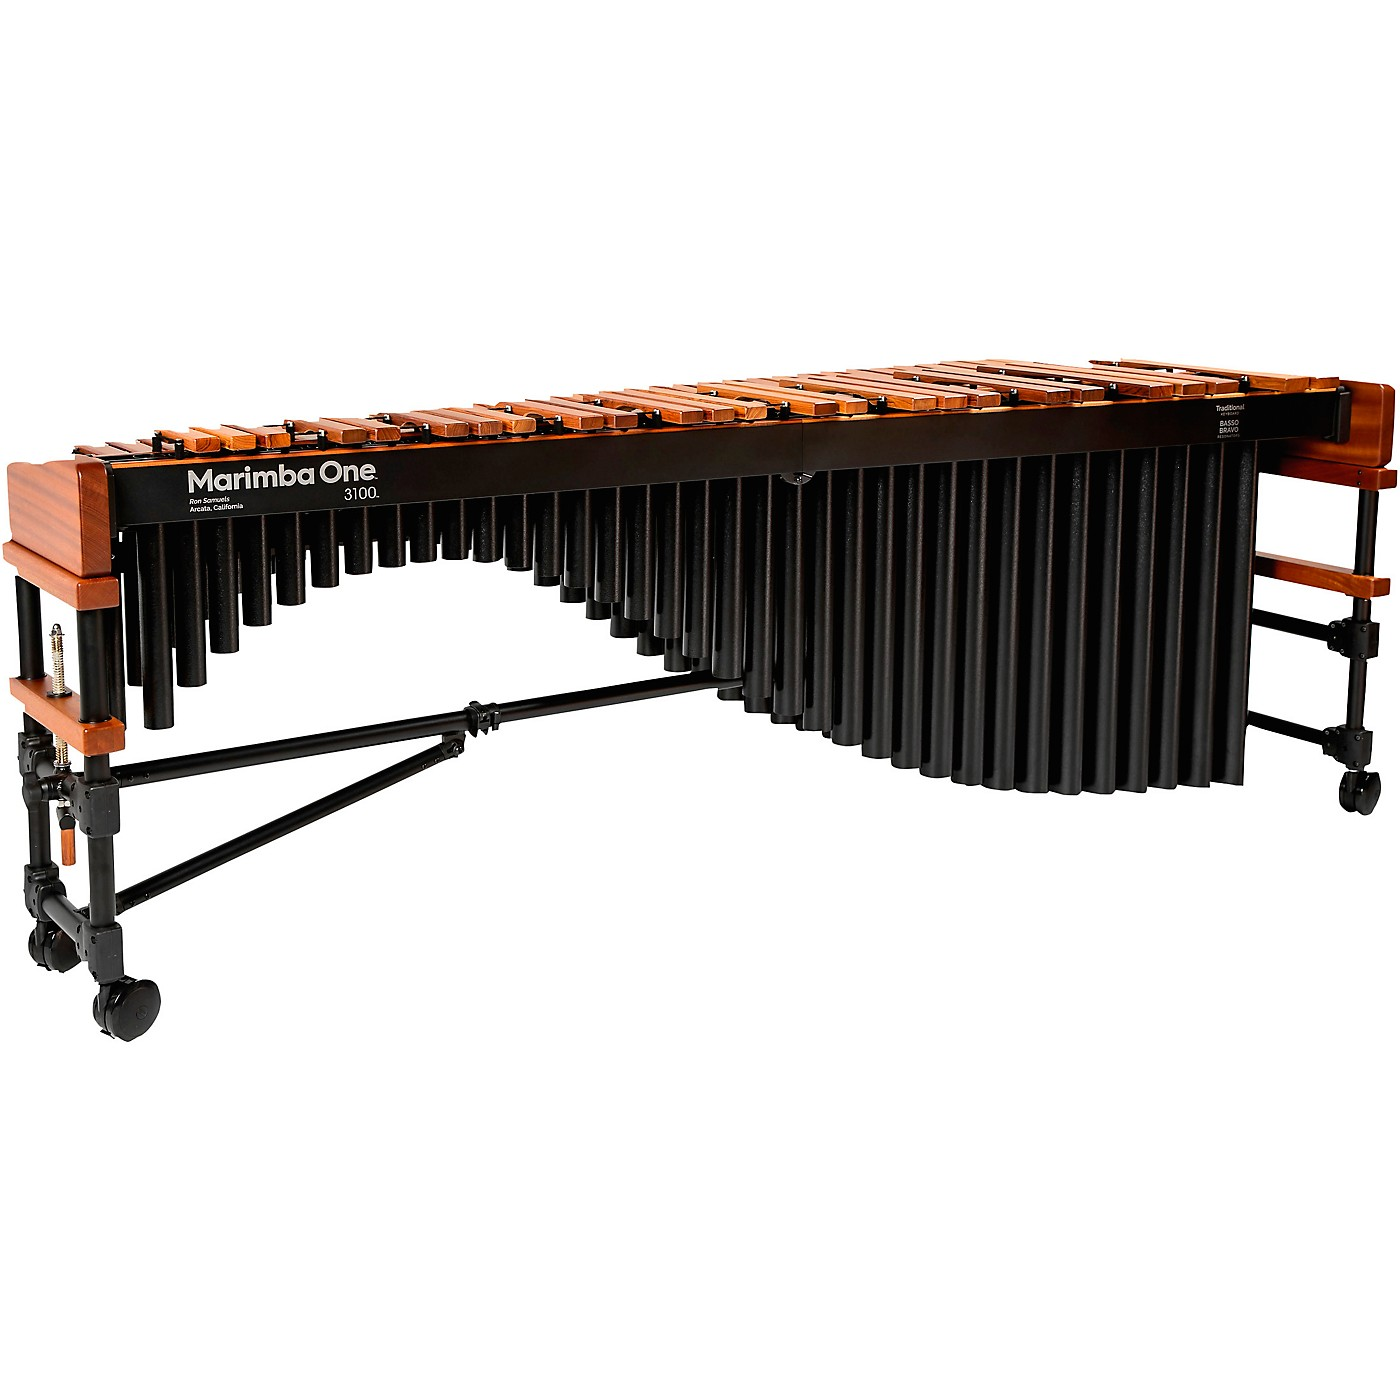 Marimba One 3100 #9302 A442 Marimba with Enhanced Keyboard and Classic Resonators thumbnail